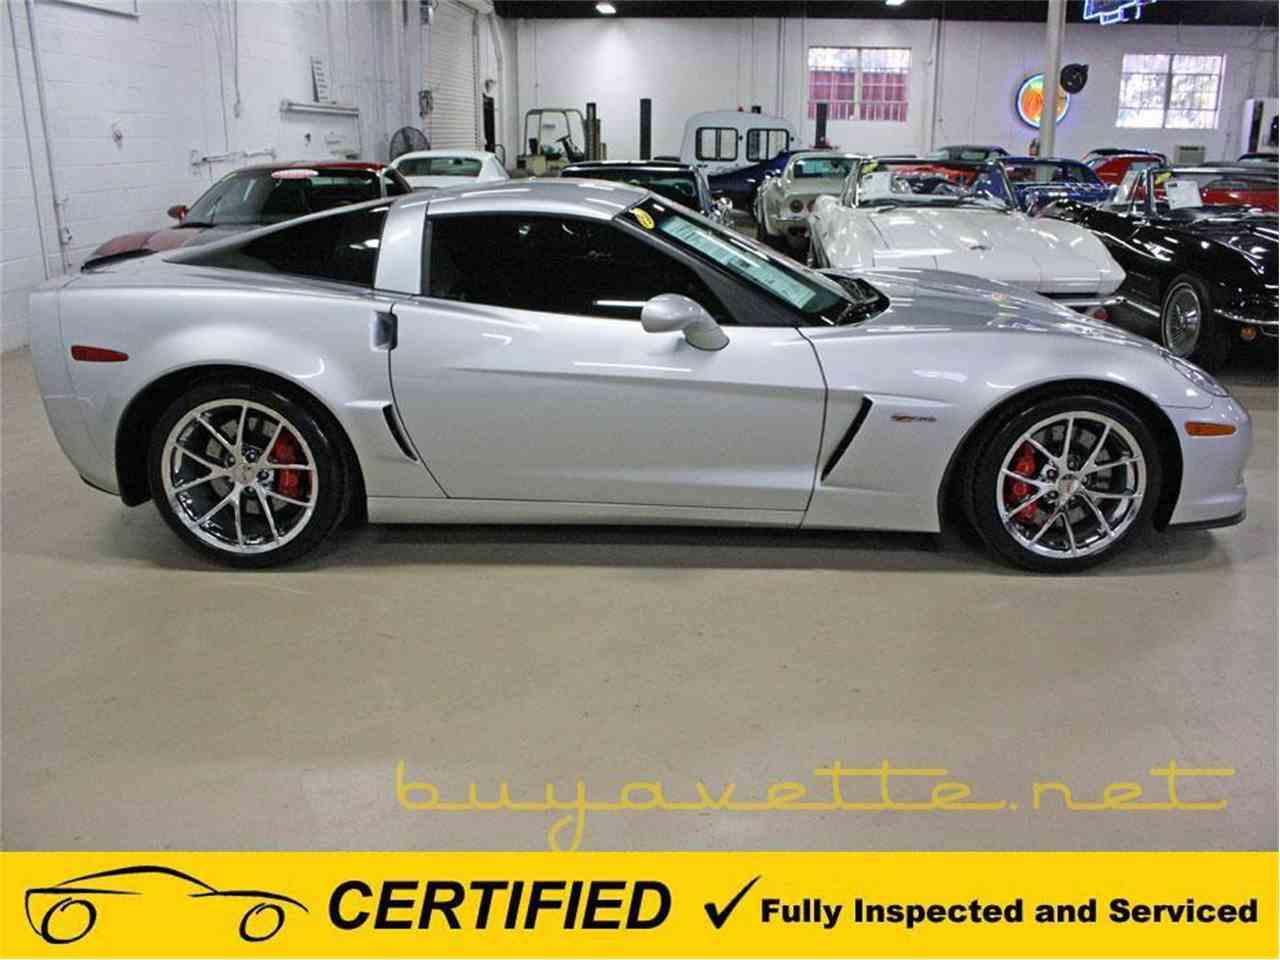 2011 Chevrolet Corvette For Sale Classiccars Com Cc 947500